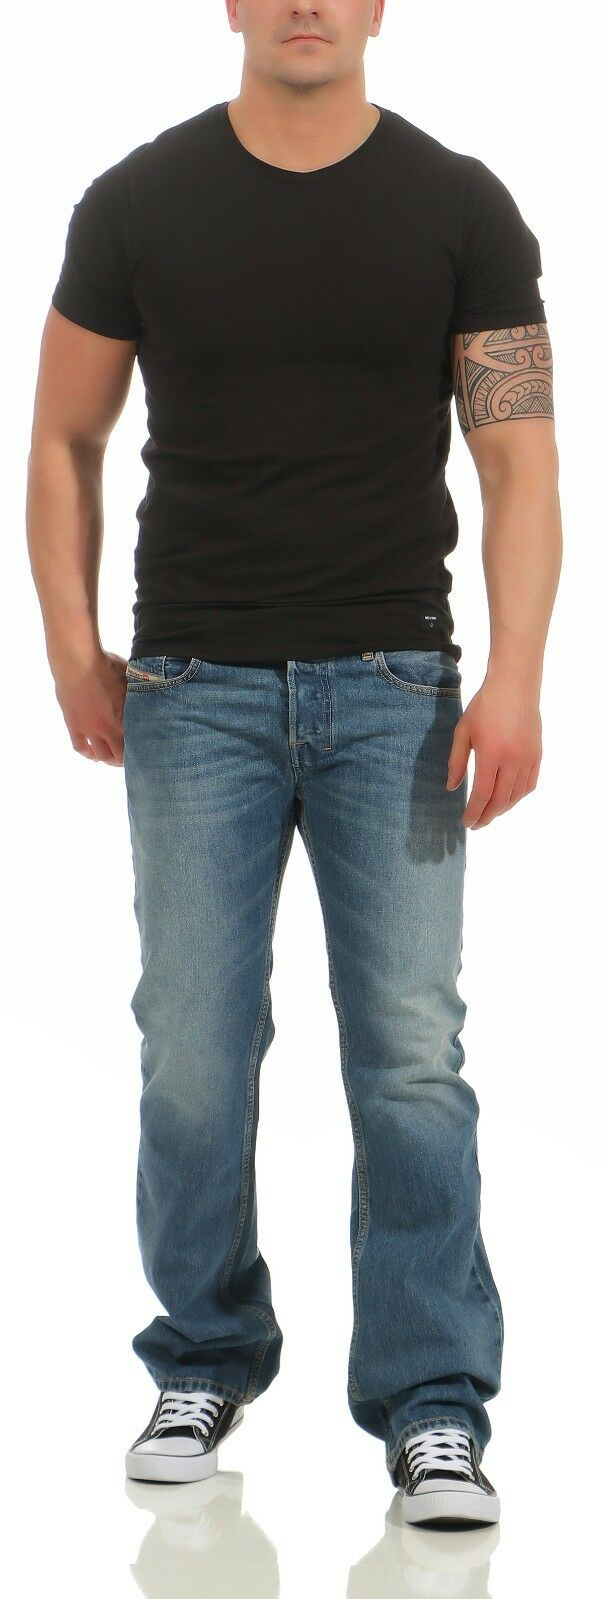 Diesel Jeans Jeans Jeans Zatiny 0800Z 800Z Herren Hose Regular Stiefel Cut Stiefelcut L32 NEU b647ad